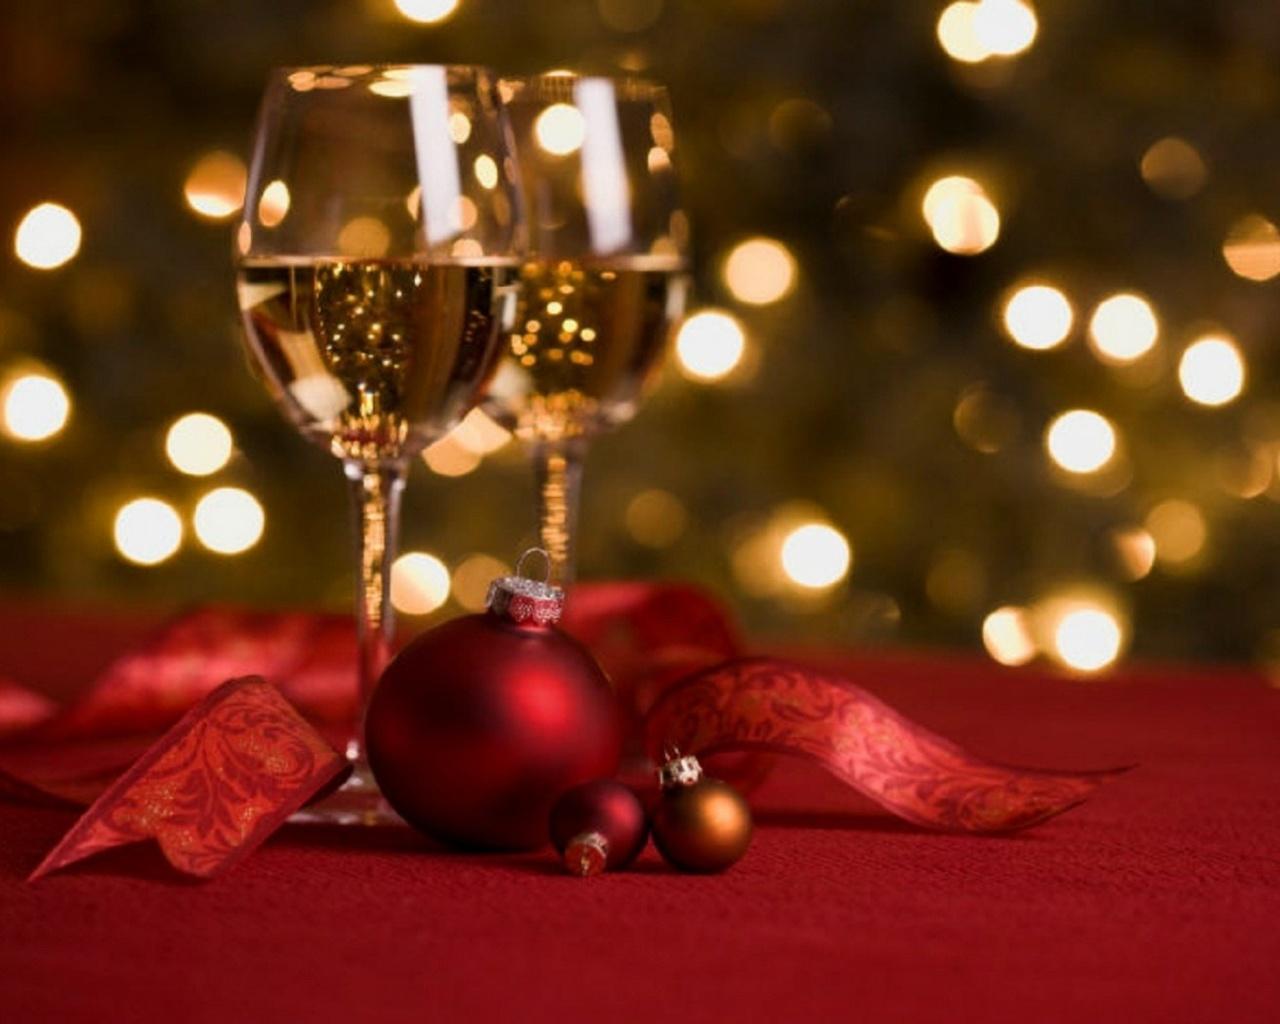 red, bokeh, lights, night, christmas, wine, ball, new year, holiday